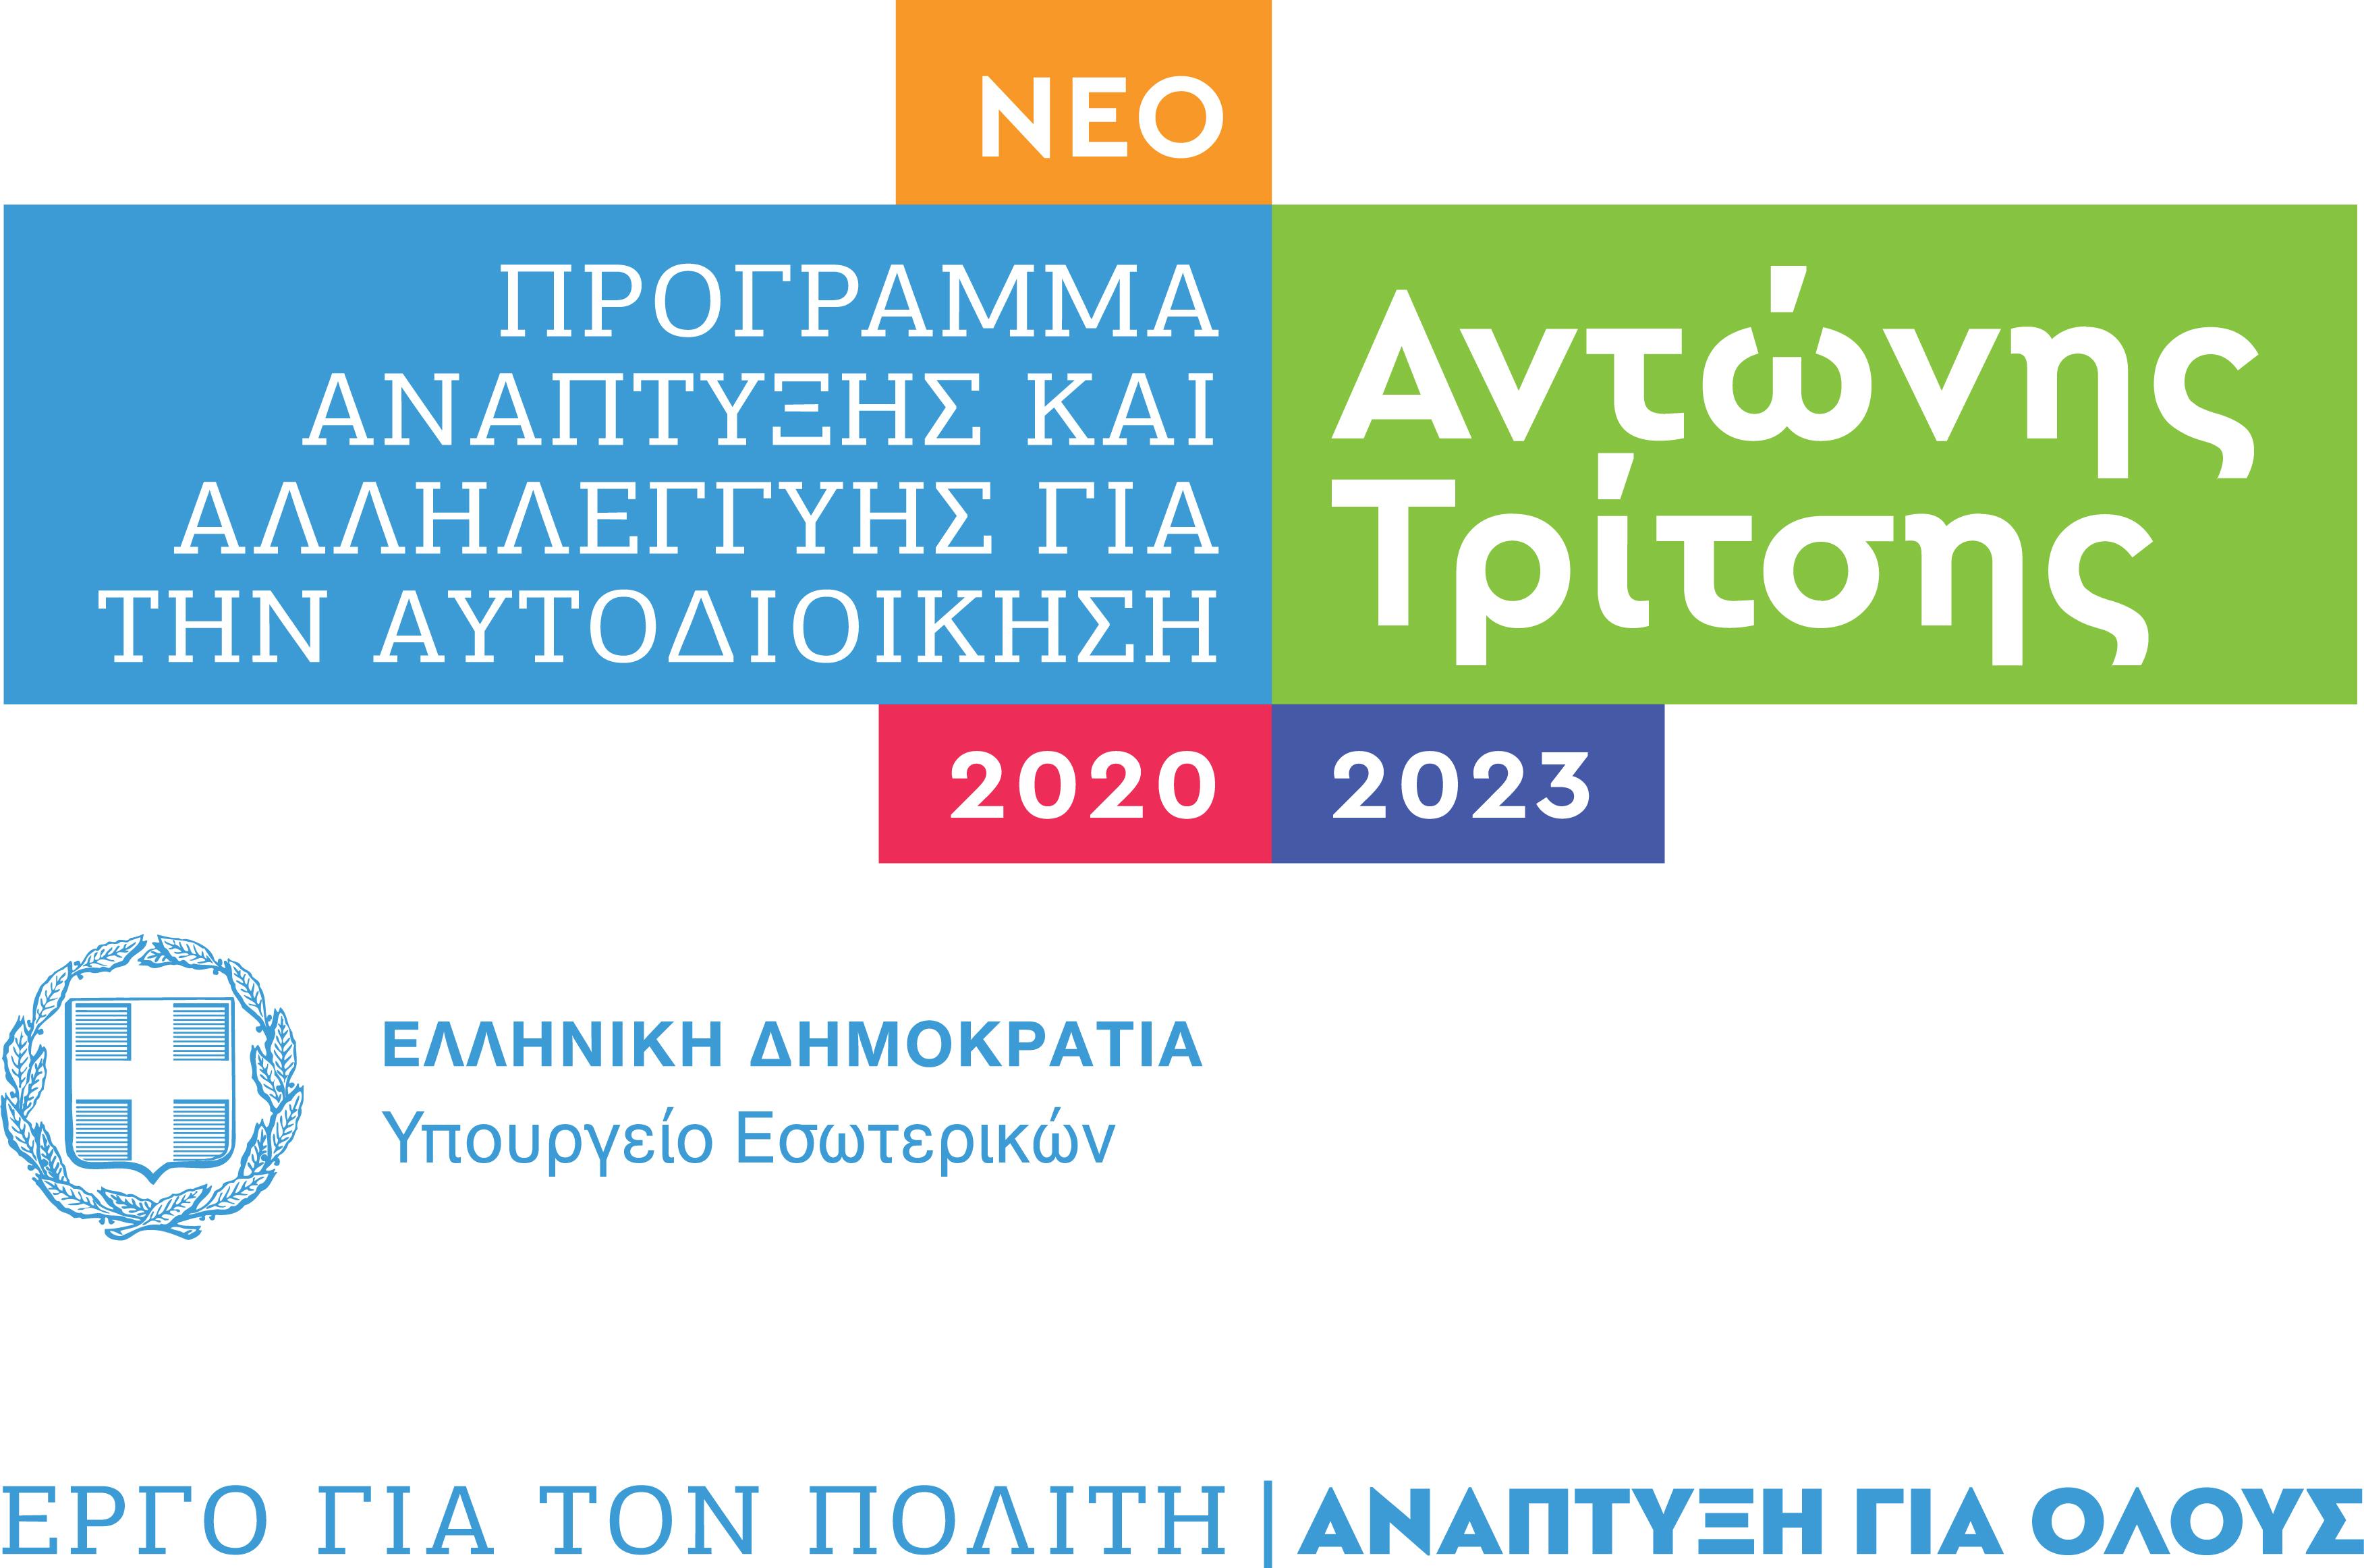 Antonis Tritsis : Brand Short Description Type Here.